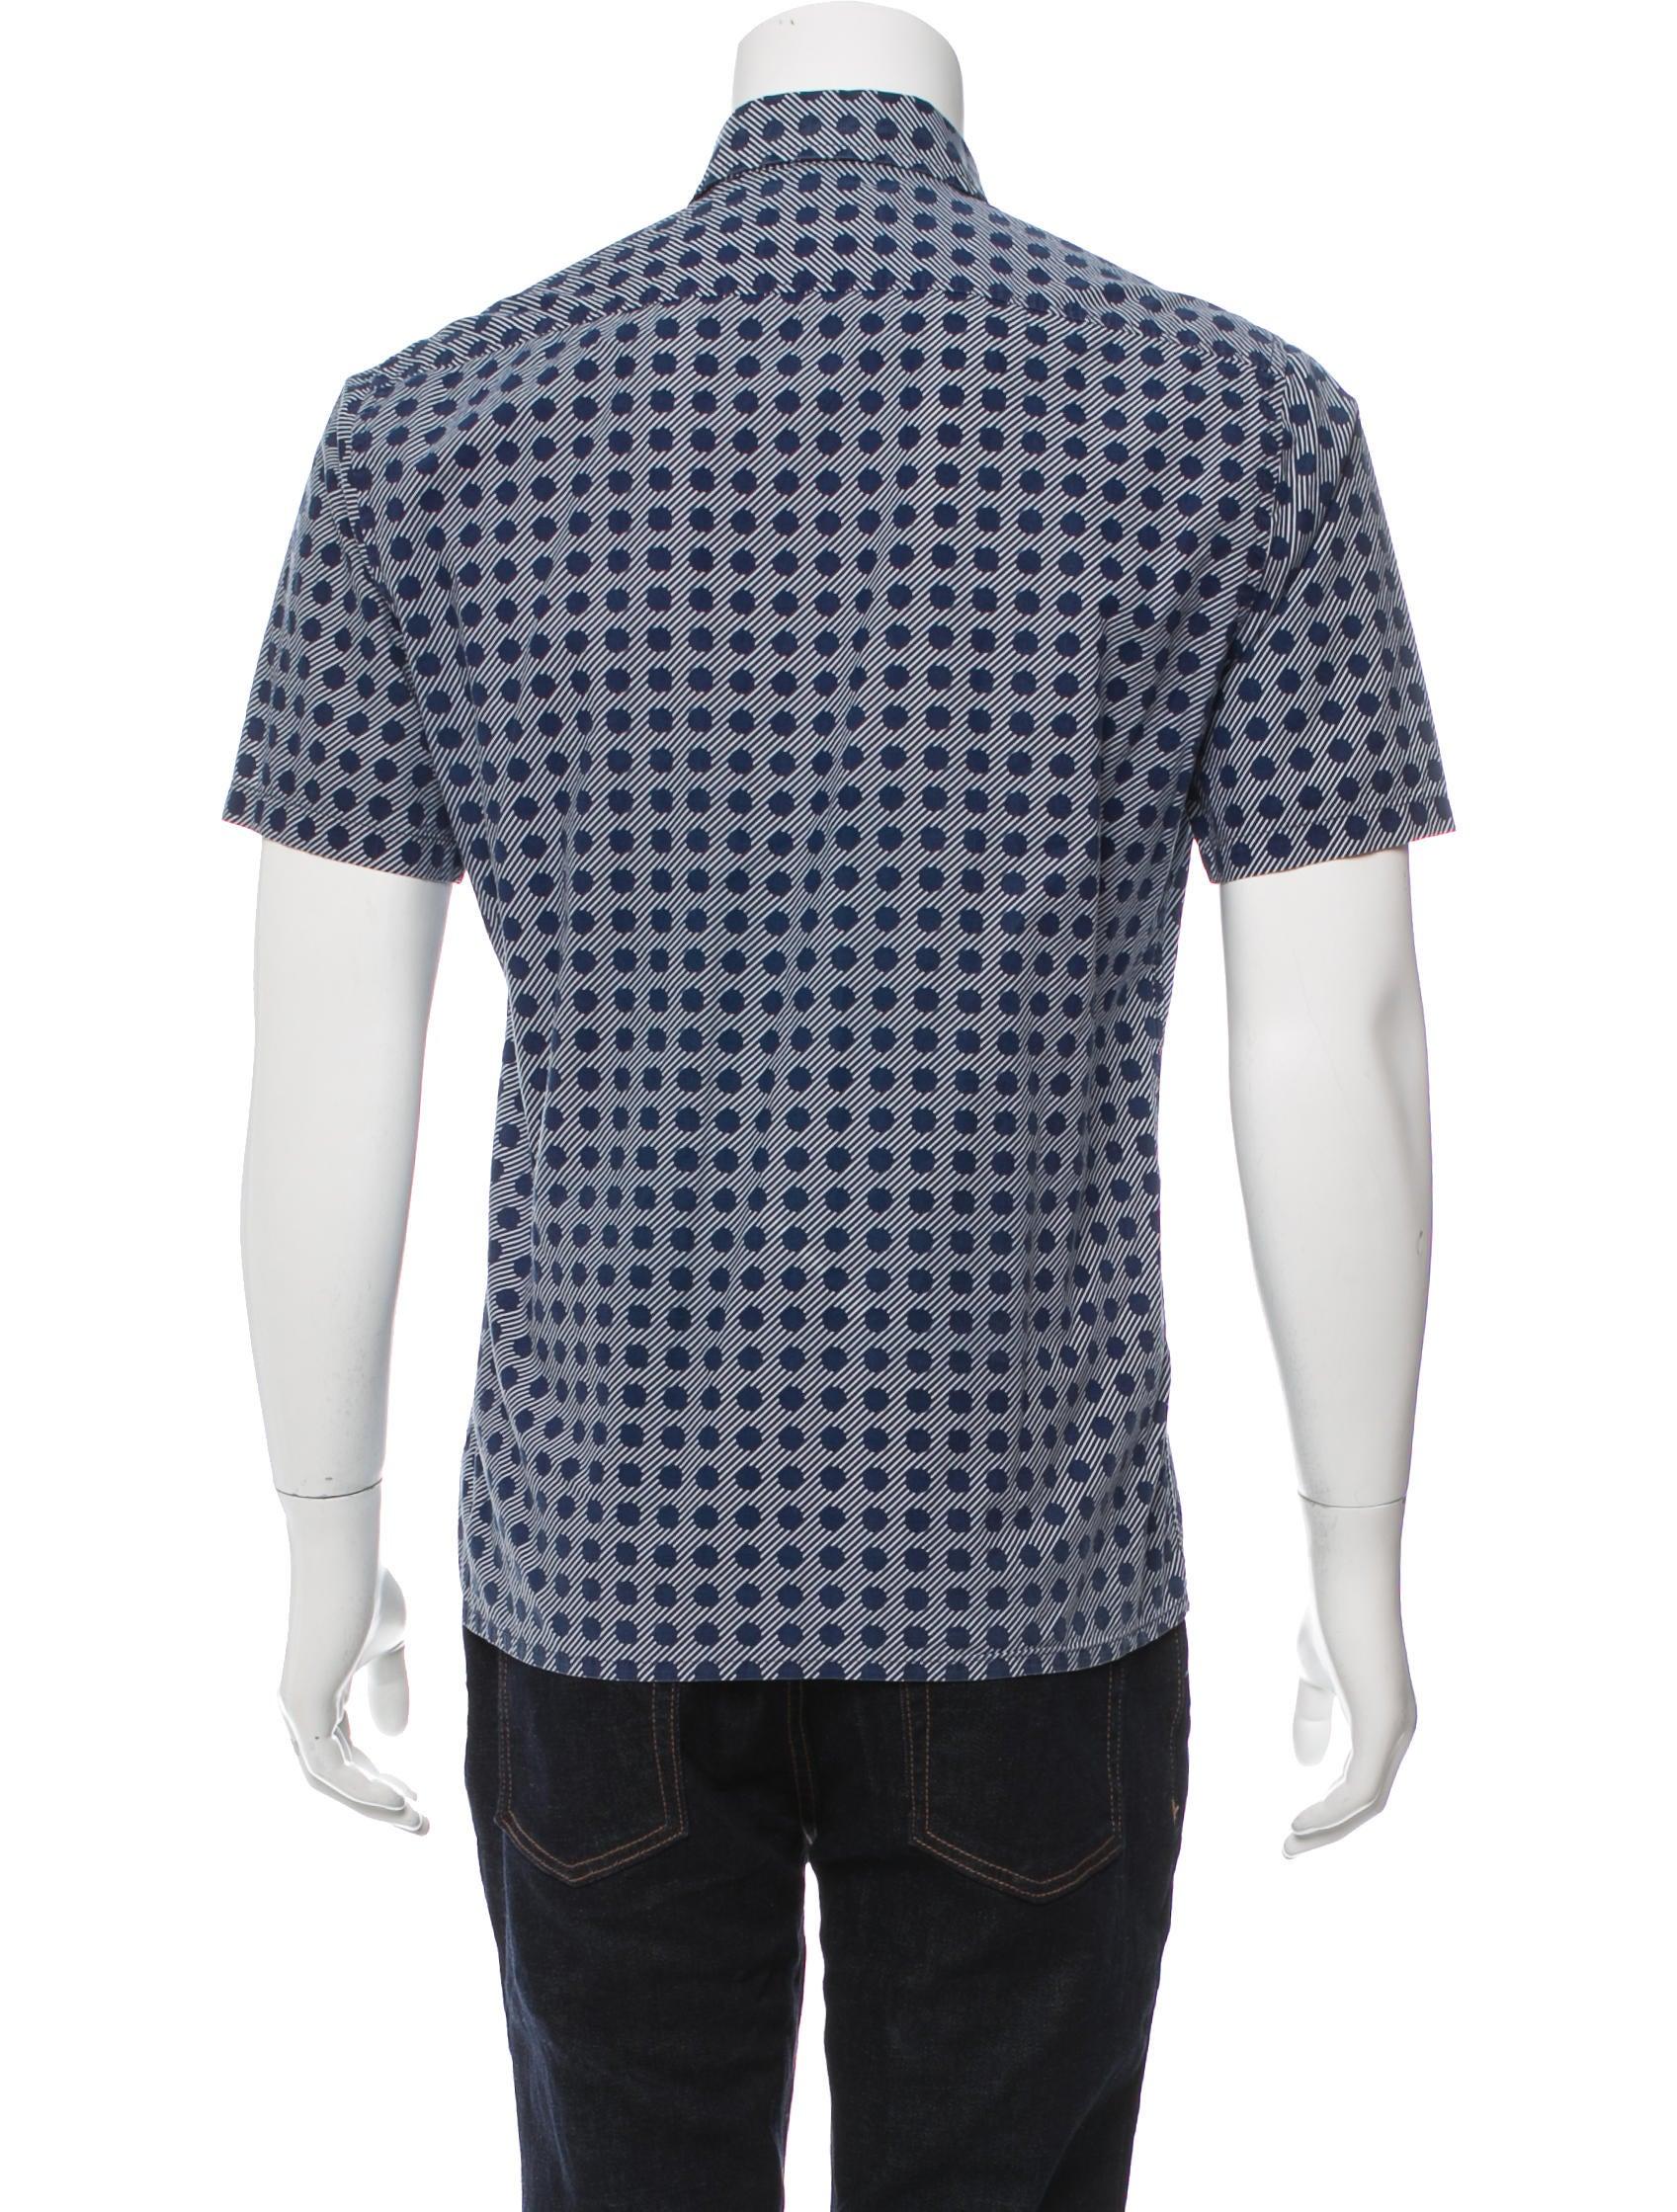 Yves saint laurent printed button up shirt clothing for Yves saint laurent logo shirt